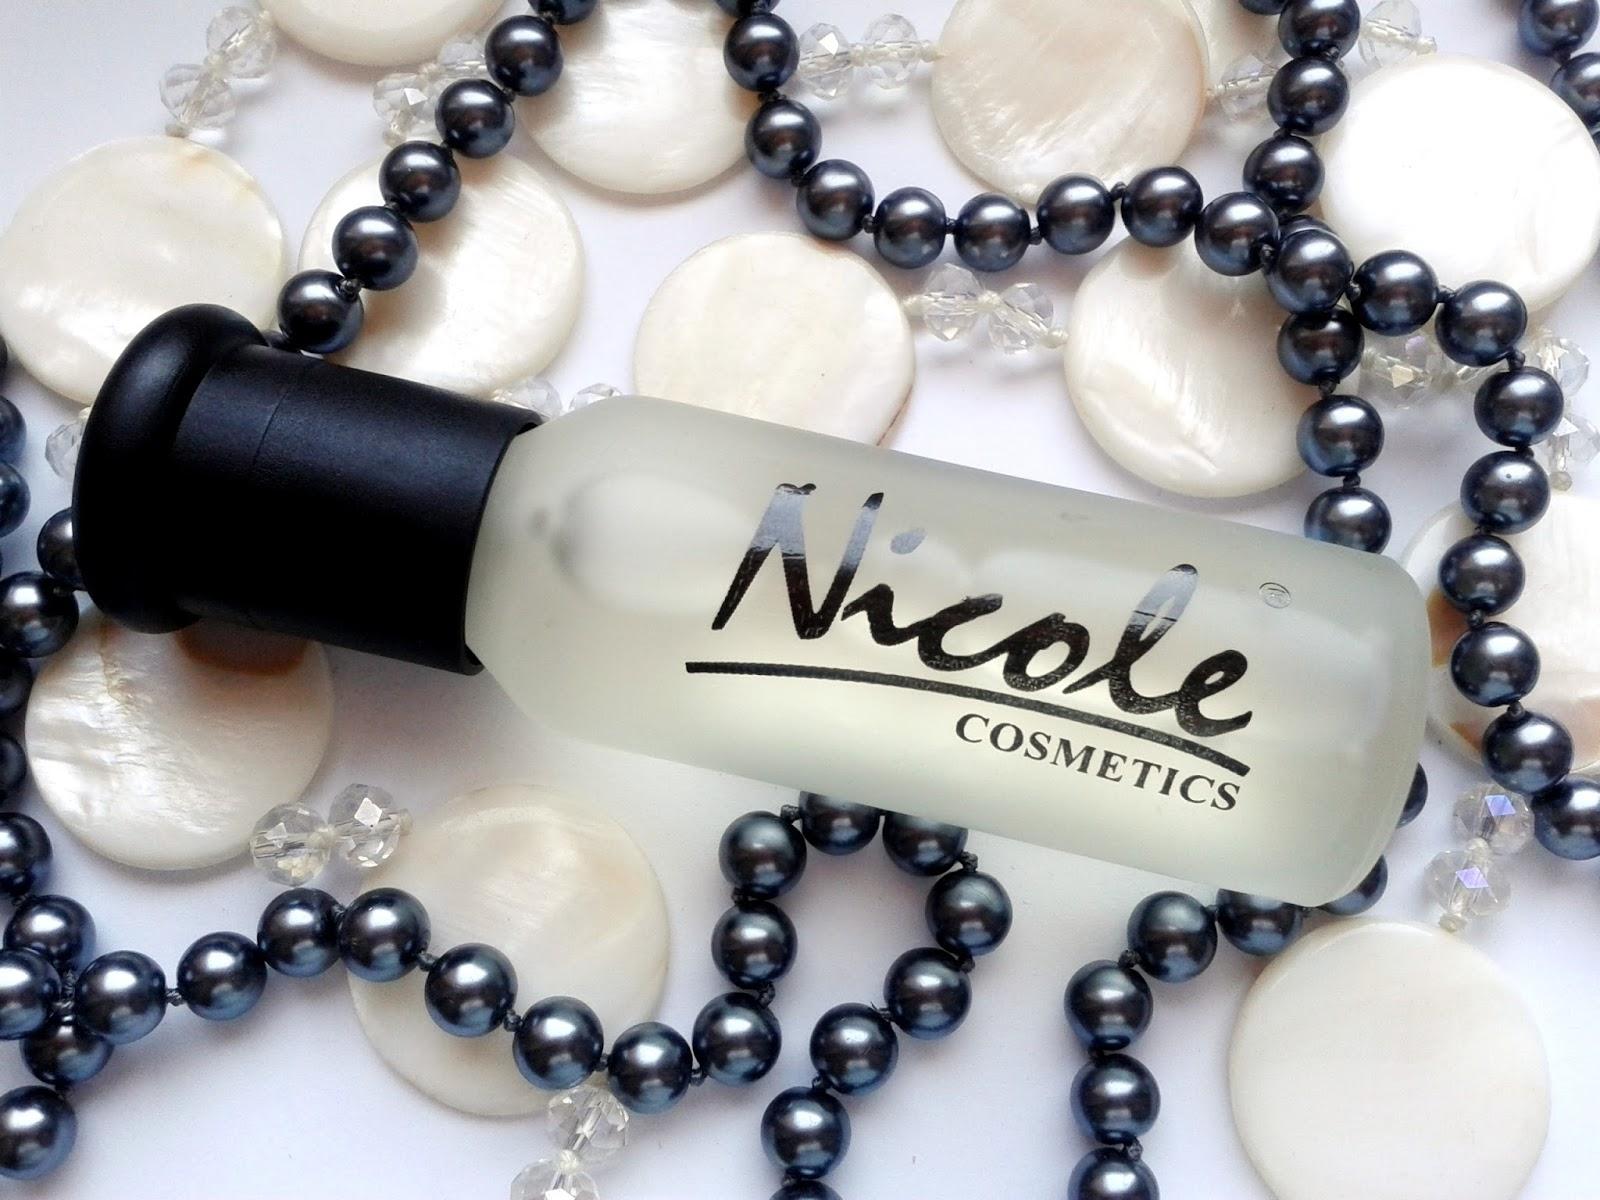 EUPHORIA Calvin Klein Nicole cosmetics 110